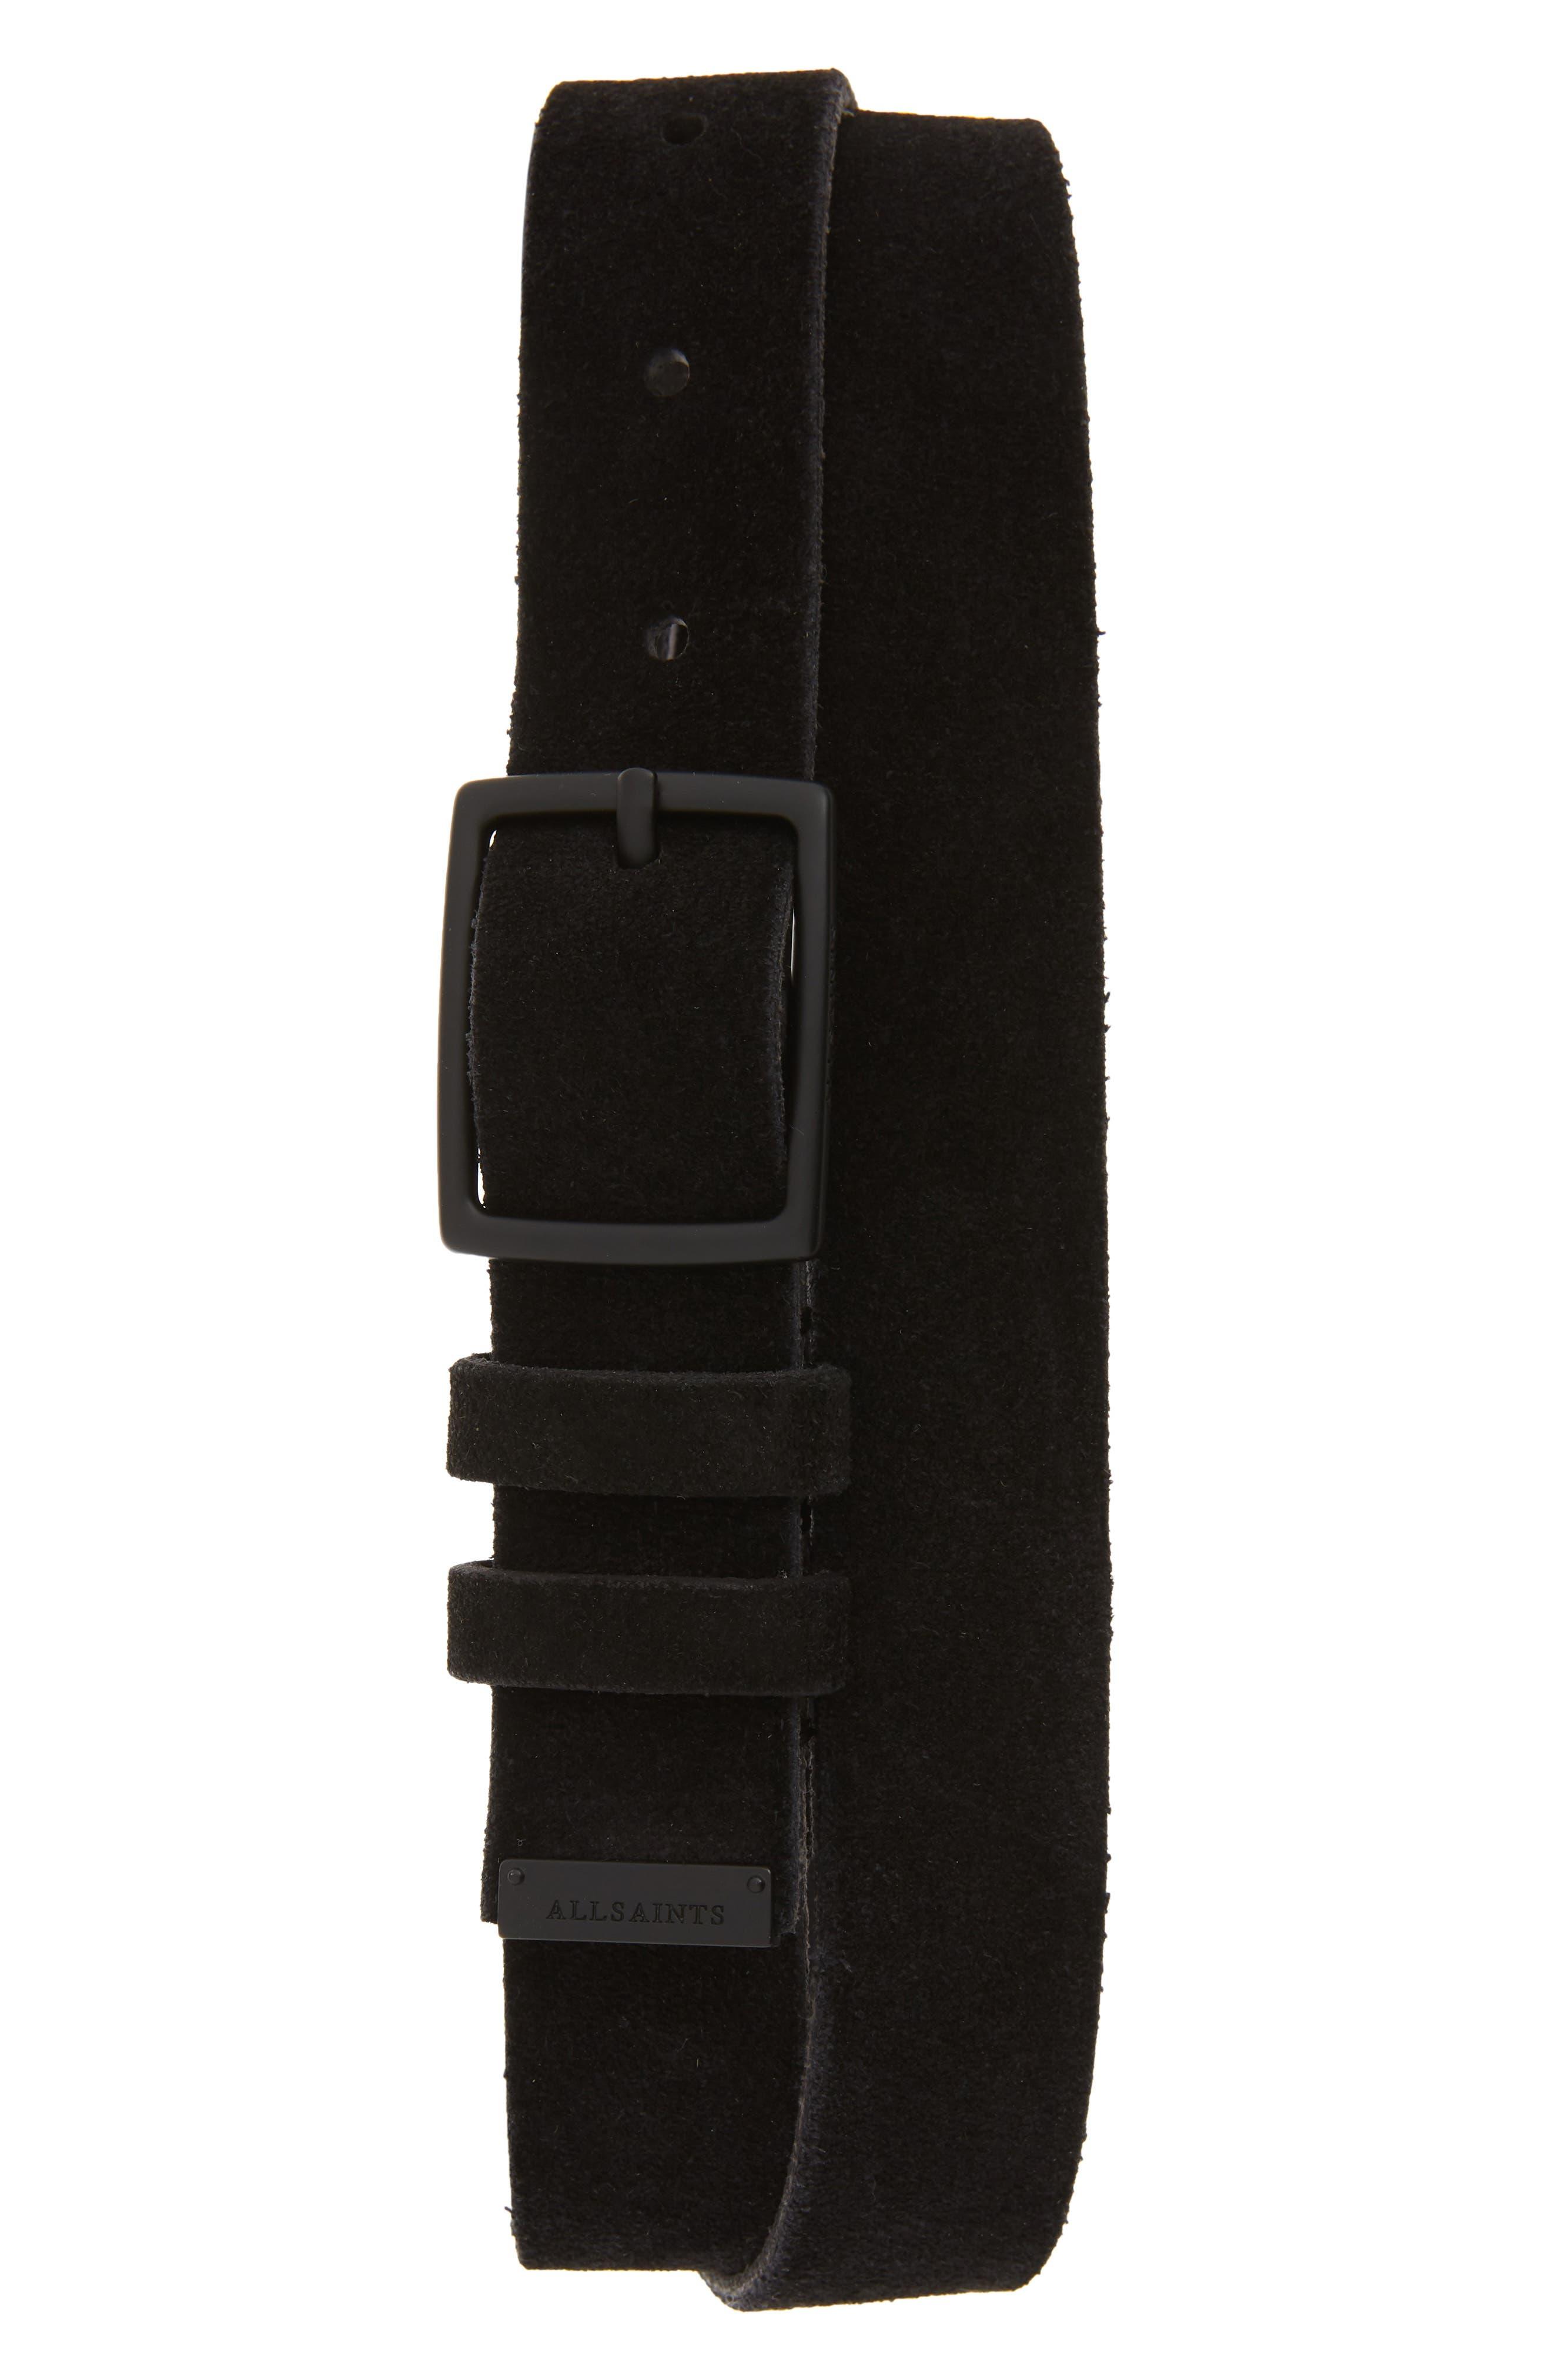 Allsaints Suede Belt, Black